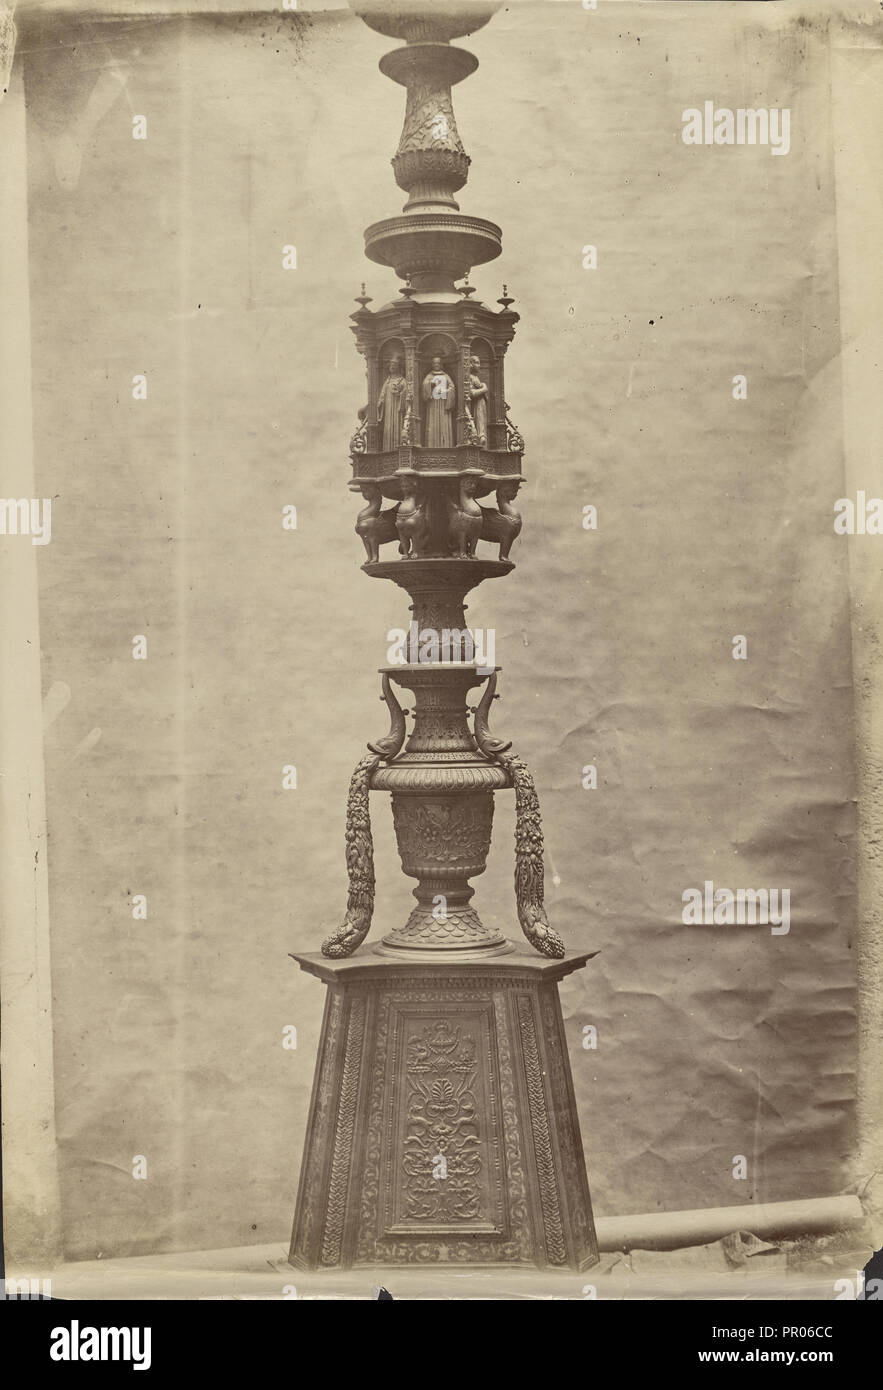 Candelabro en Santa Maria en Organo; Verona, Italia; alrededor de 1865 - 1885; Albúmina imprimir plata Imagen De Stock